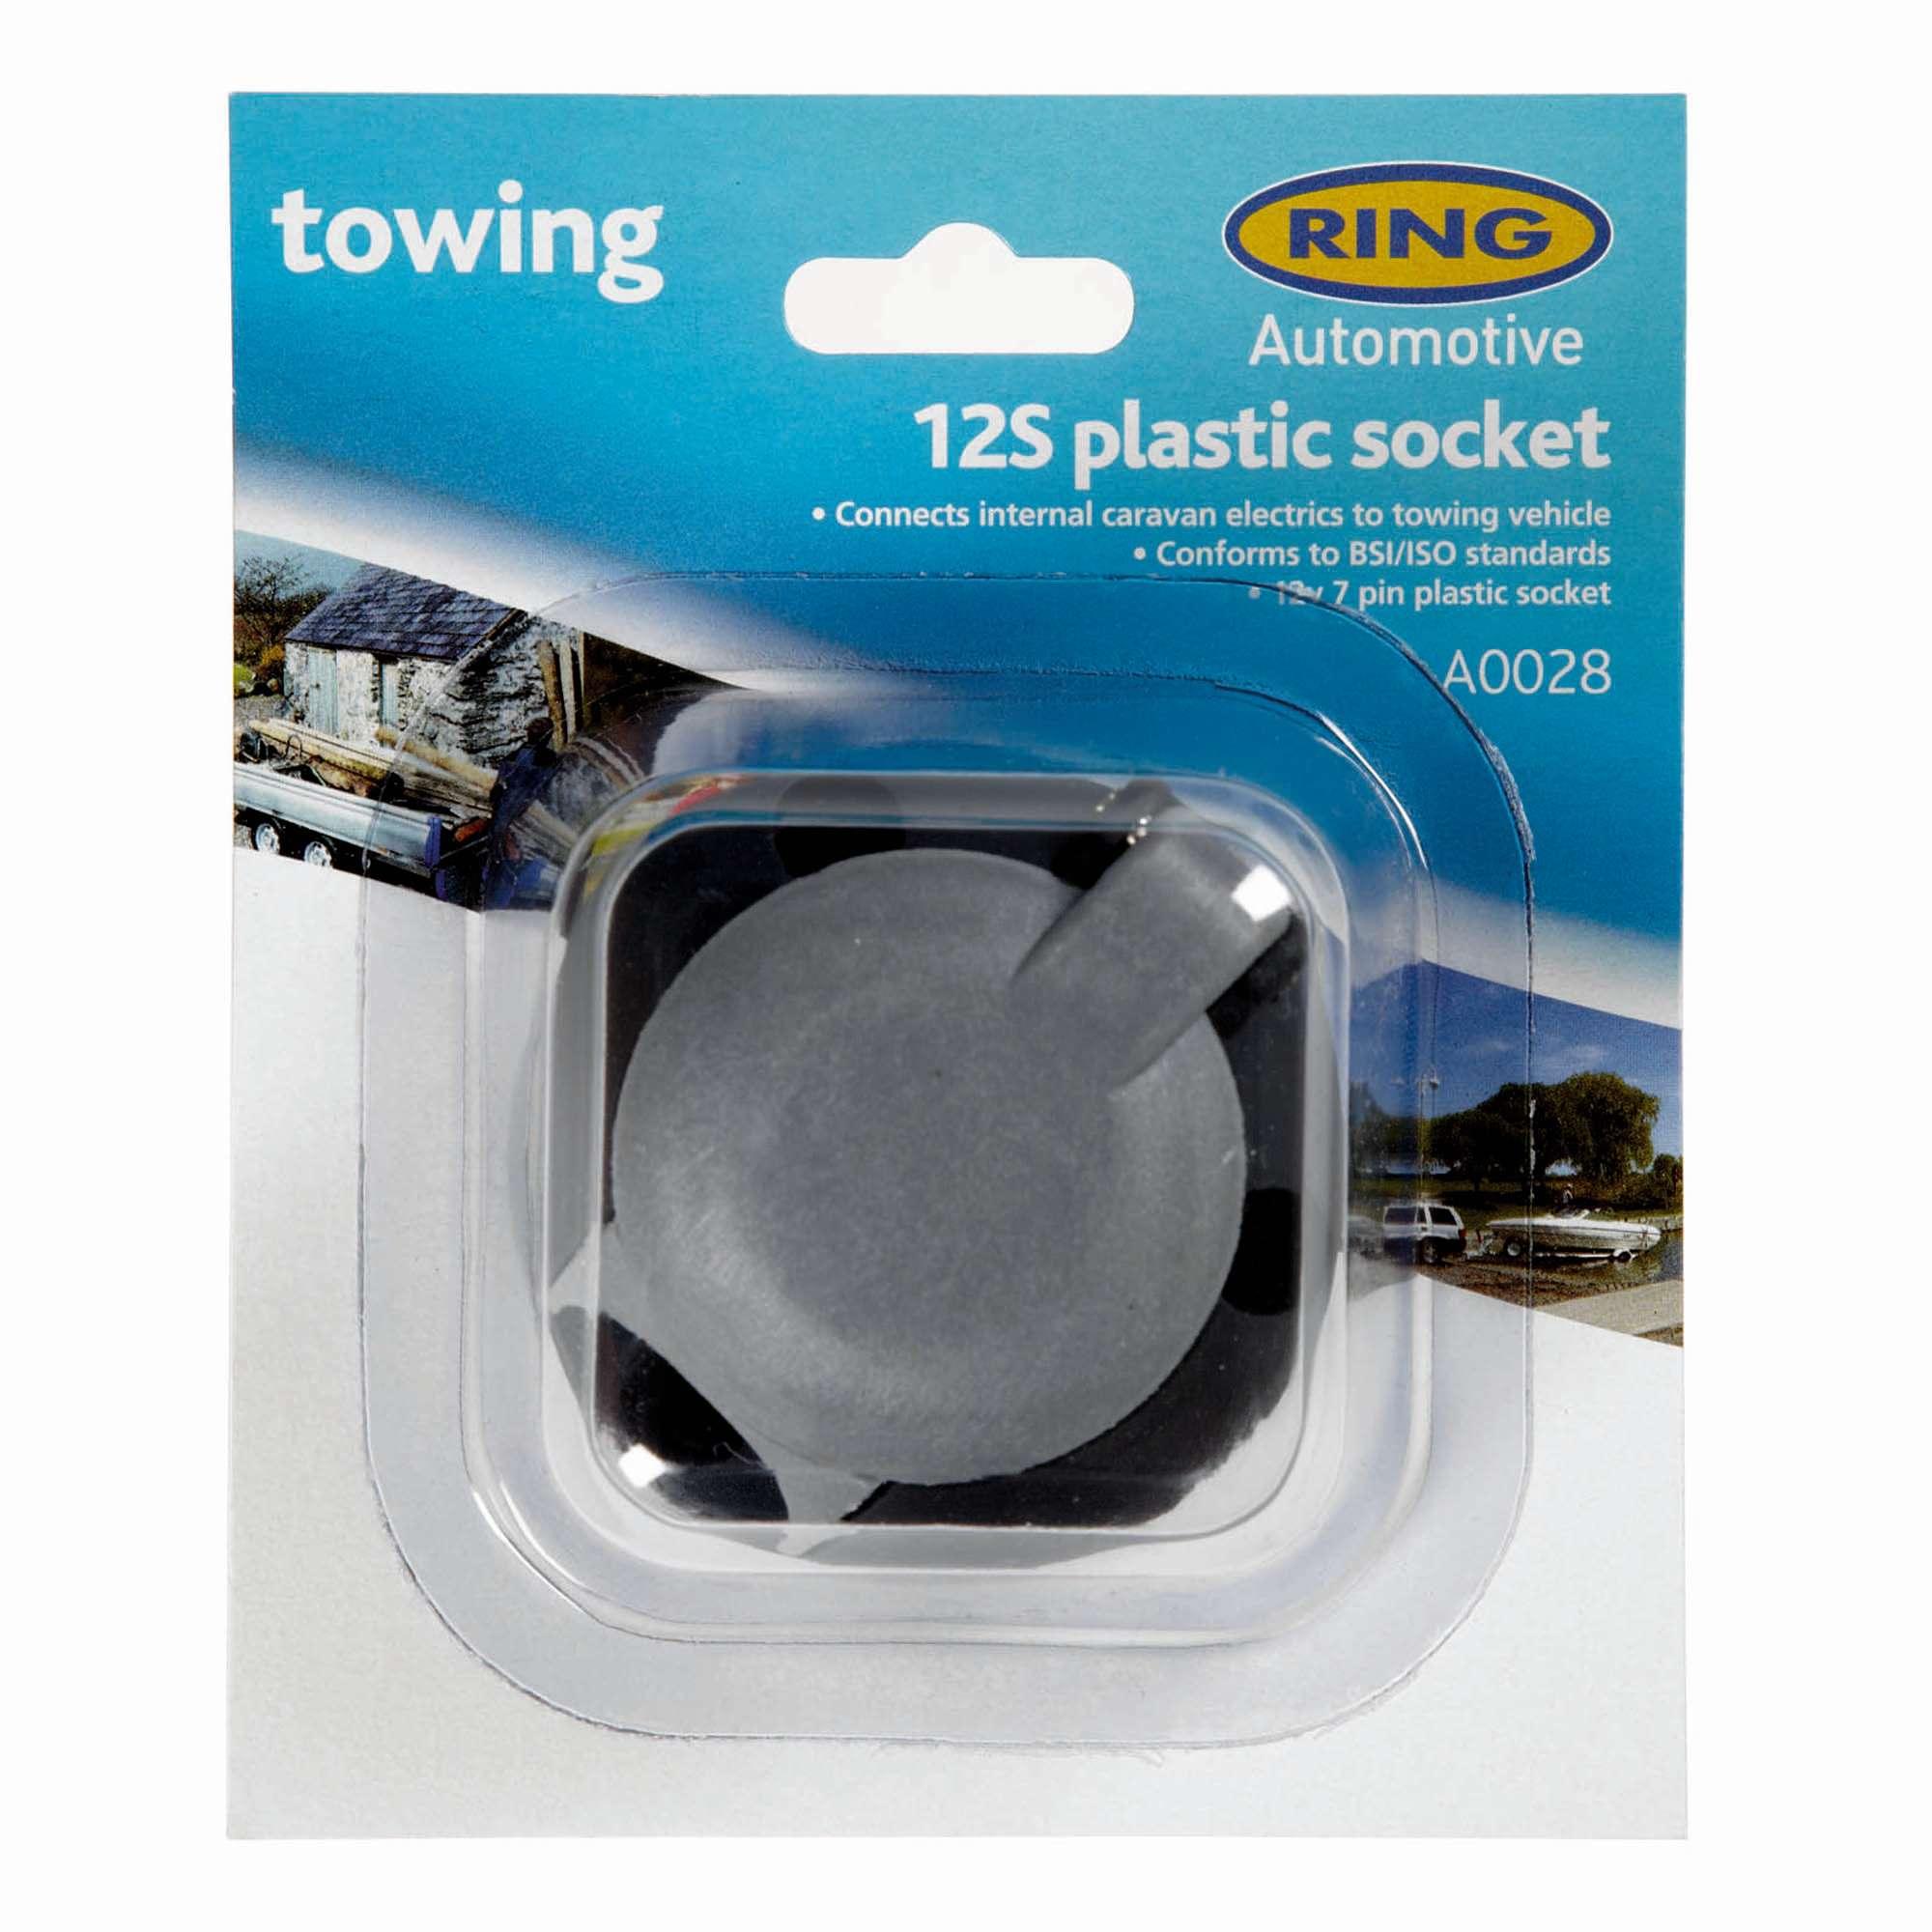 RING 12S 7 Pin Plastic Socket (A0028)